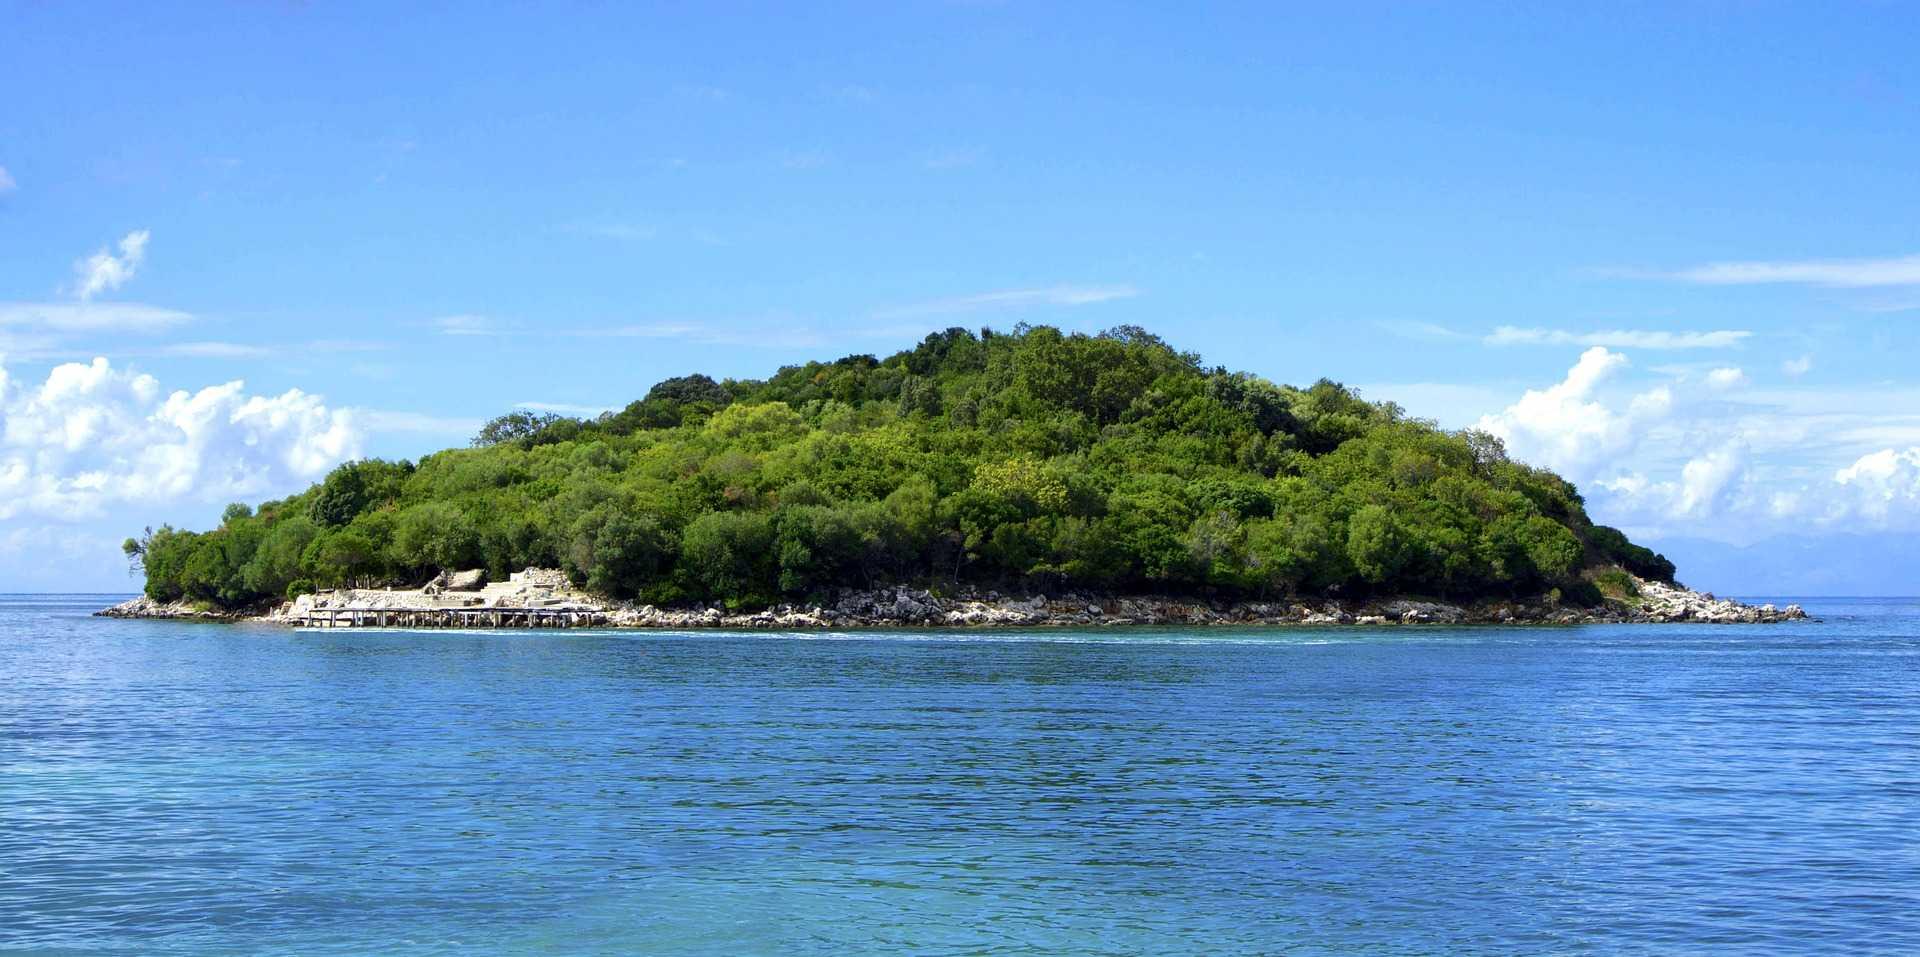 Tropical Island Beach Ambience Sound: Albanien - Badeurlaub Und Kultur